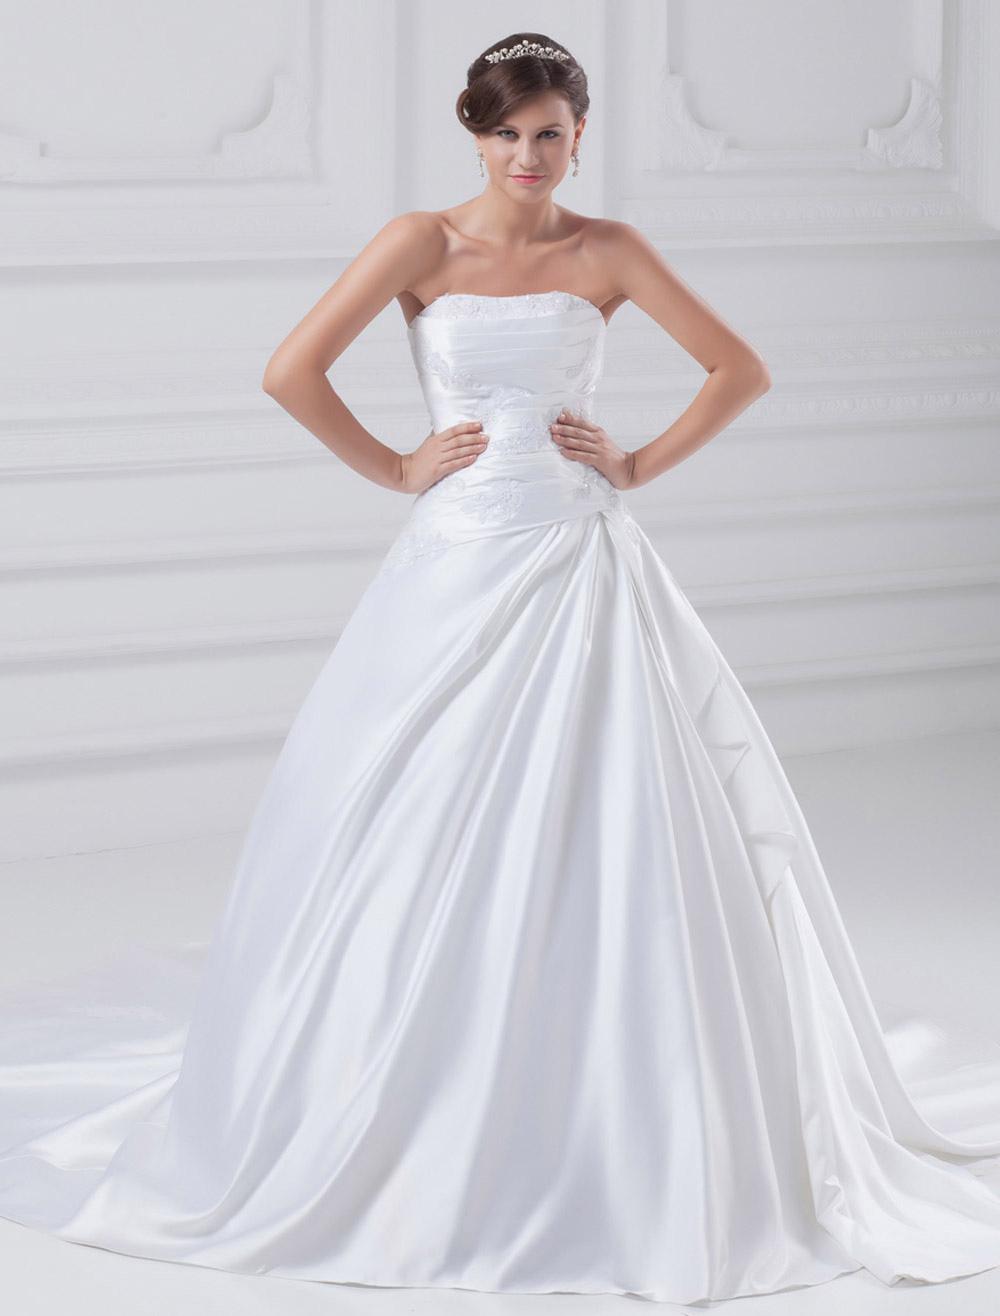 White ball gown beading satin wedding dress for bride for White silk wedding dress